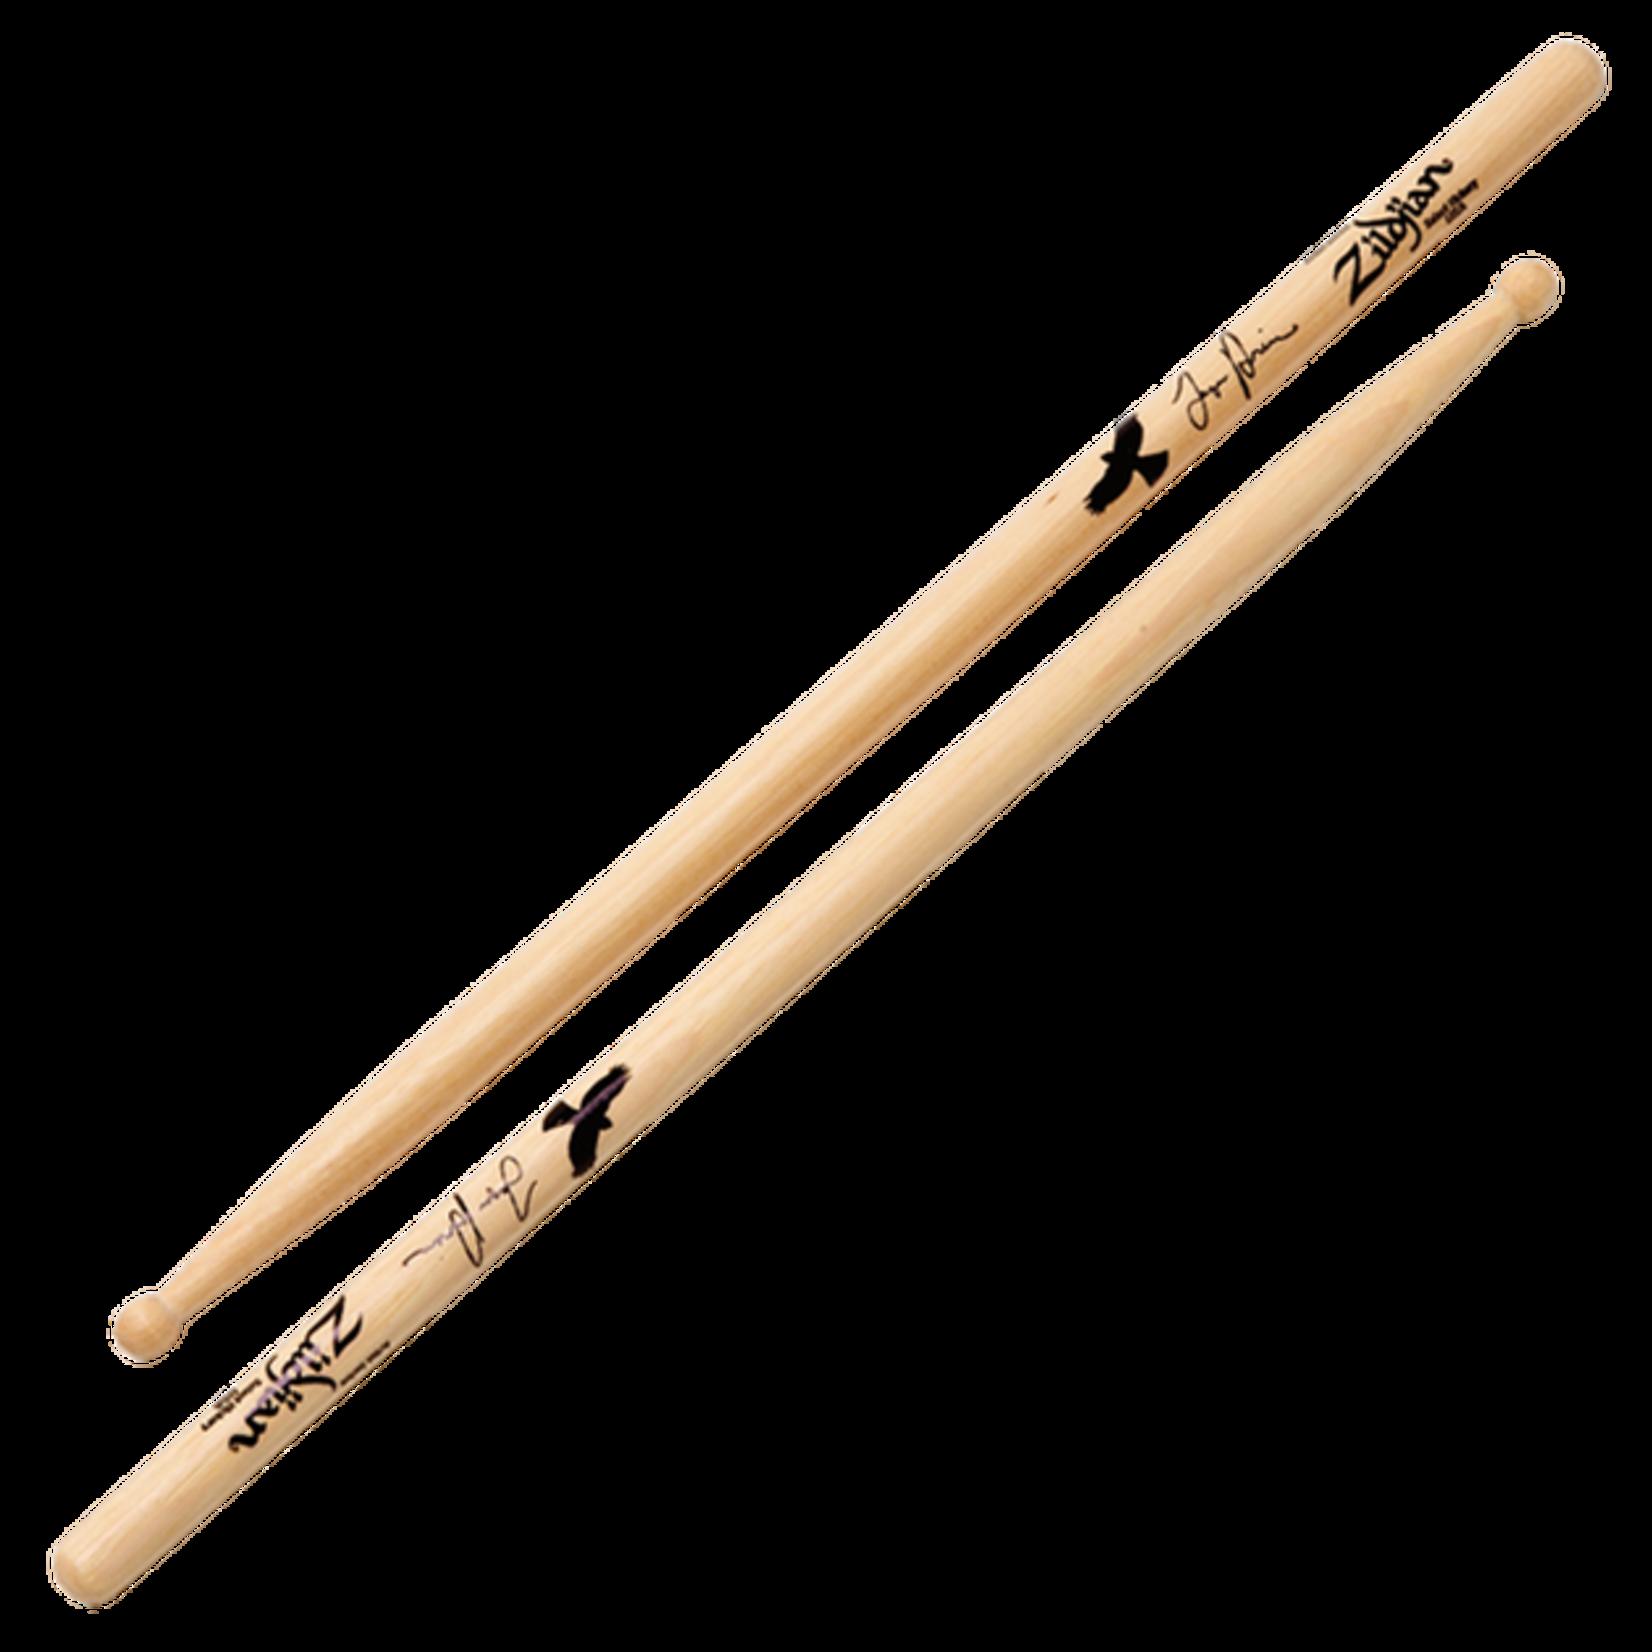 Zildjian Zildjian Taylor Hawkins Artist Series Drumsticks